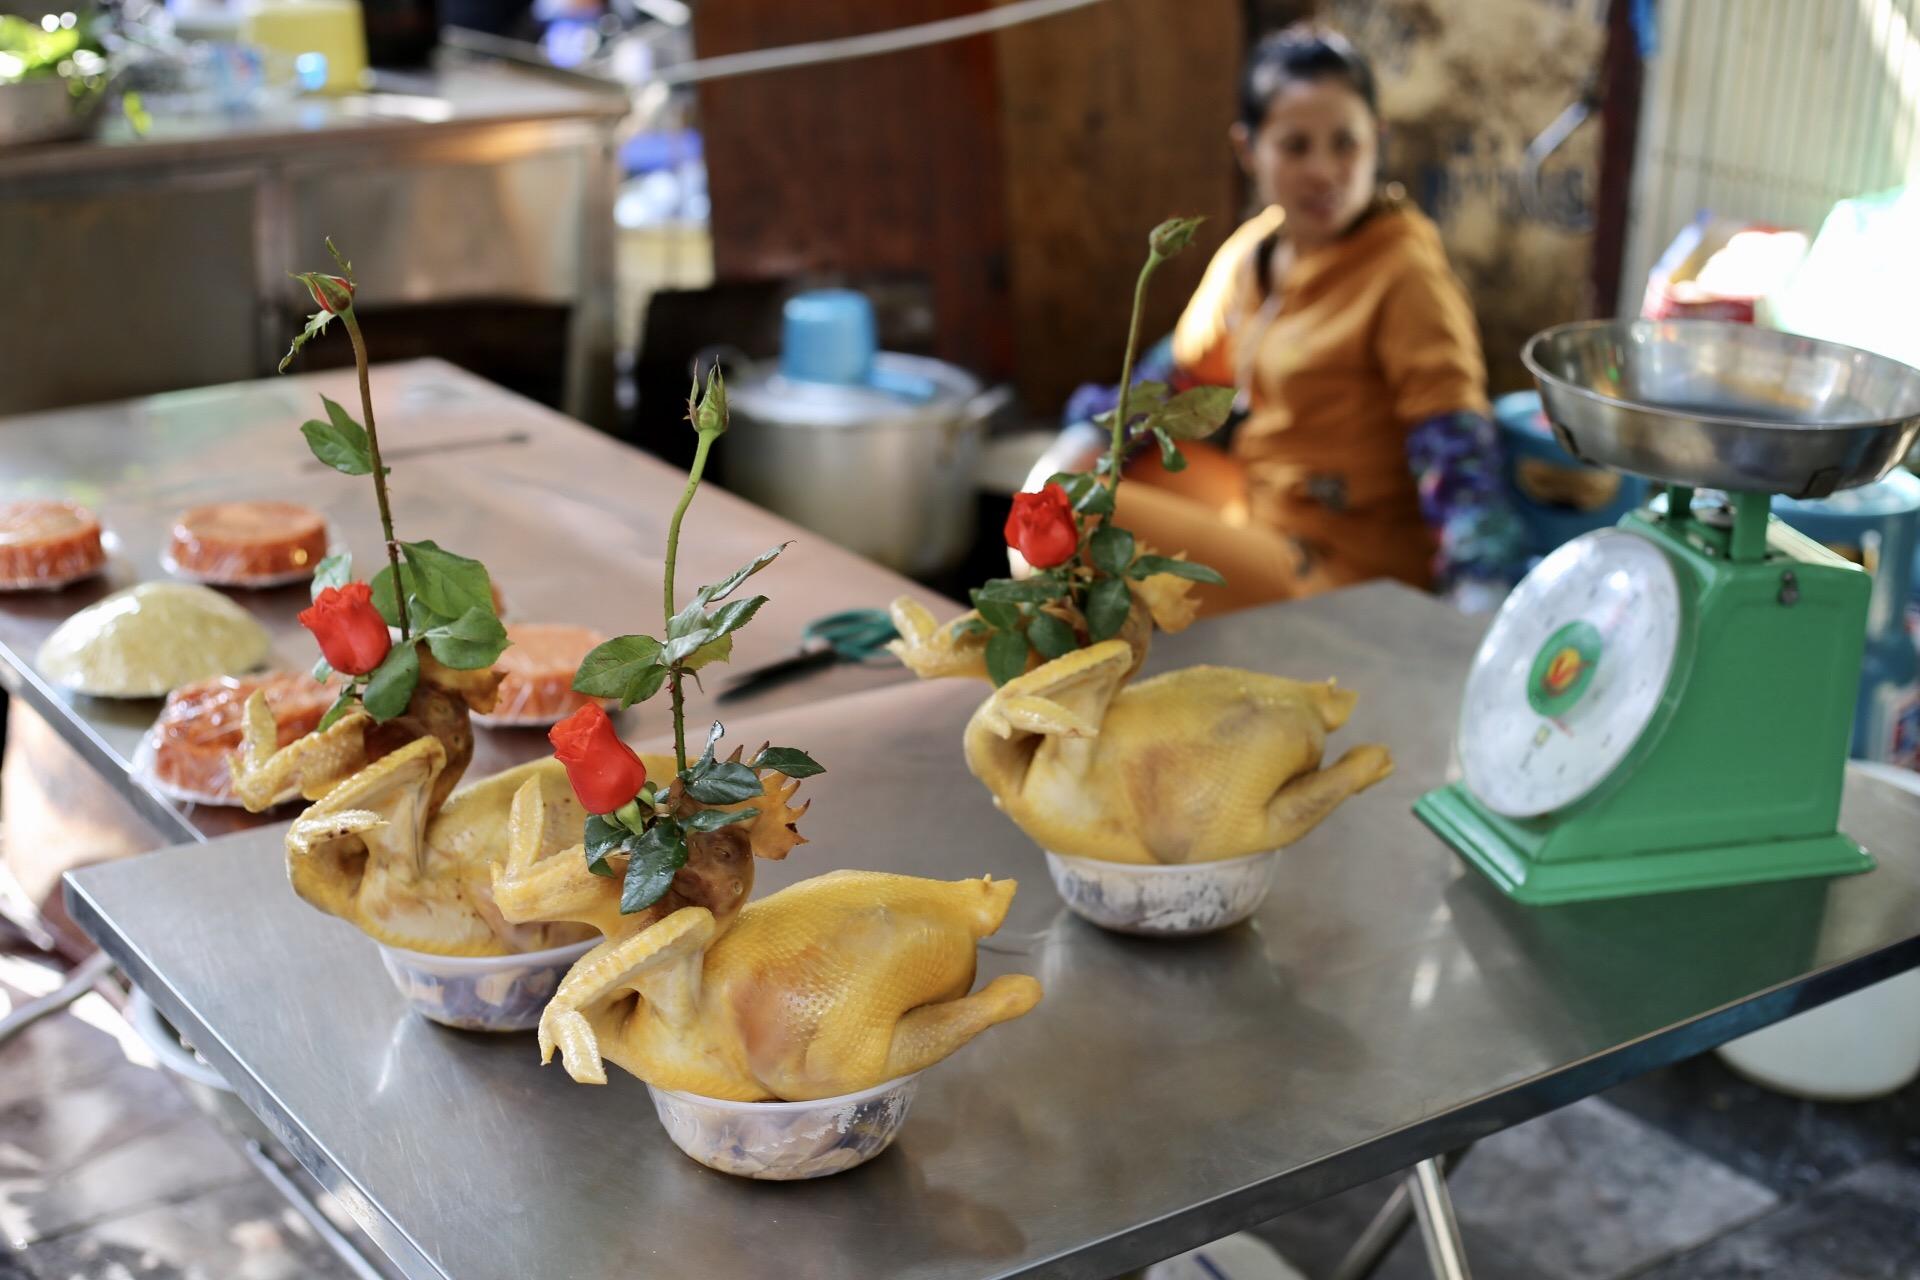 Vietnamese wedding chicken in a Hanoi market. No explanation needed.